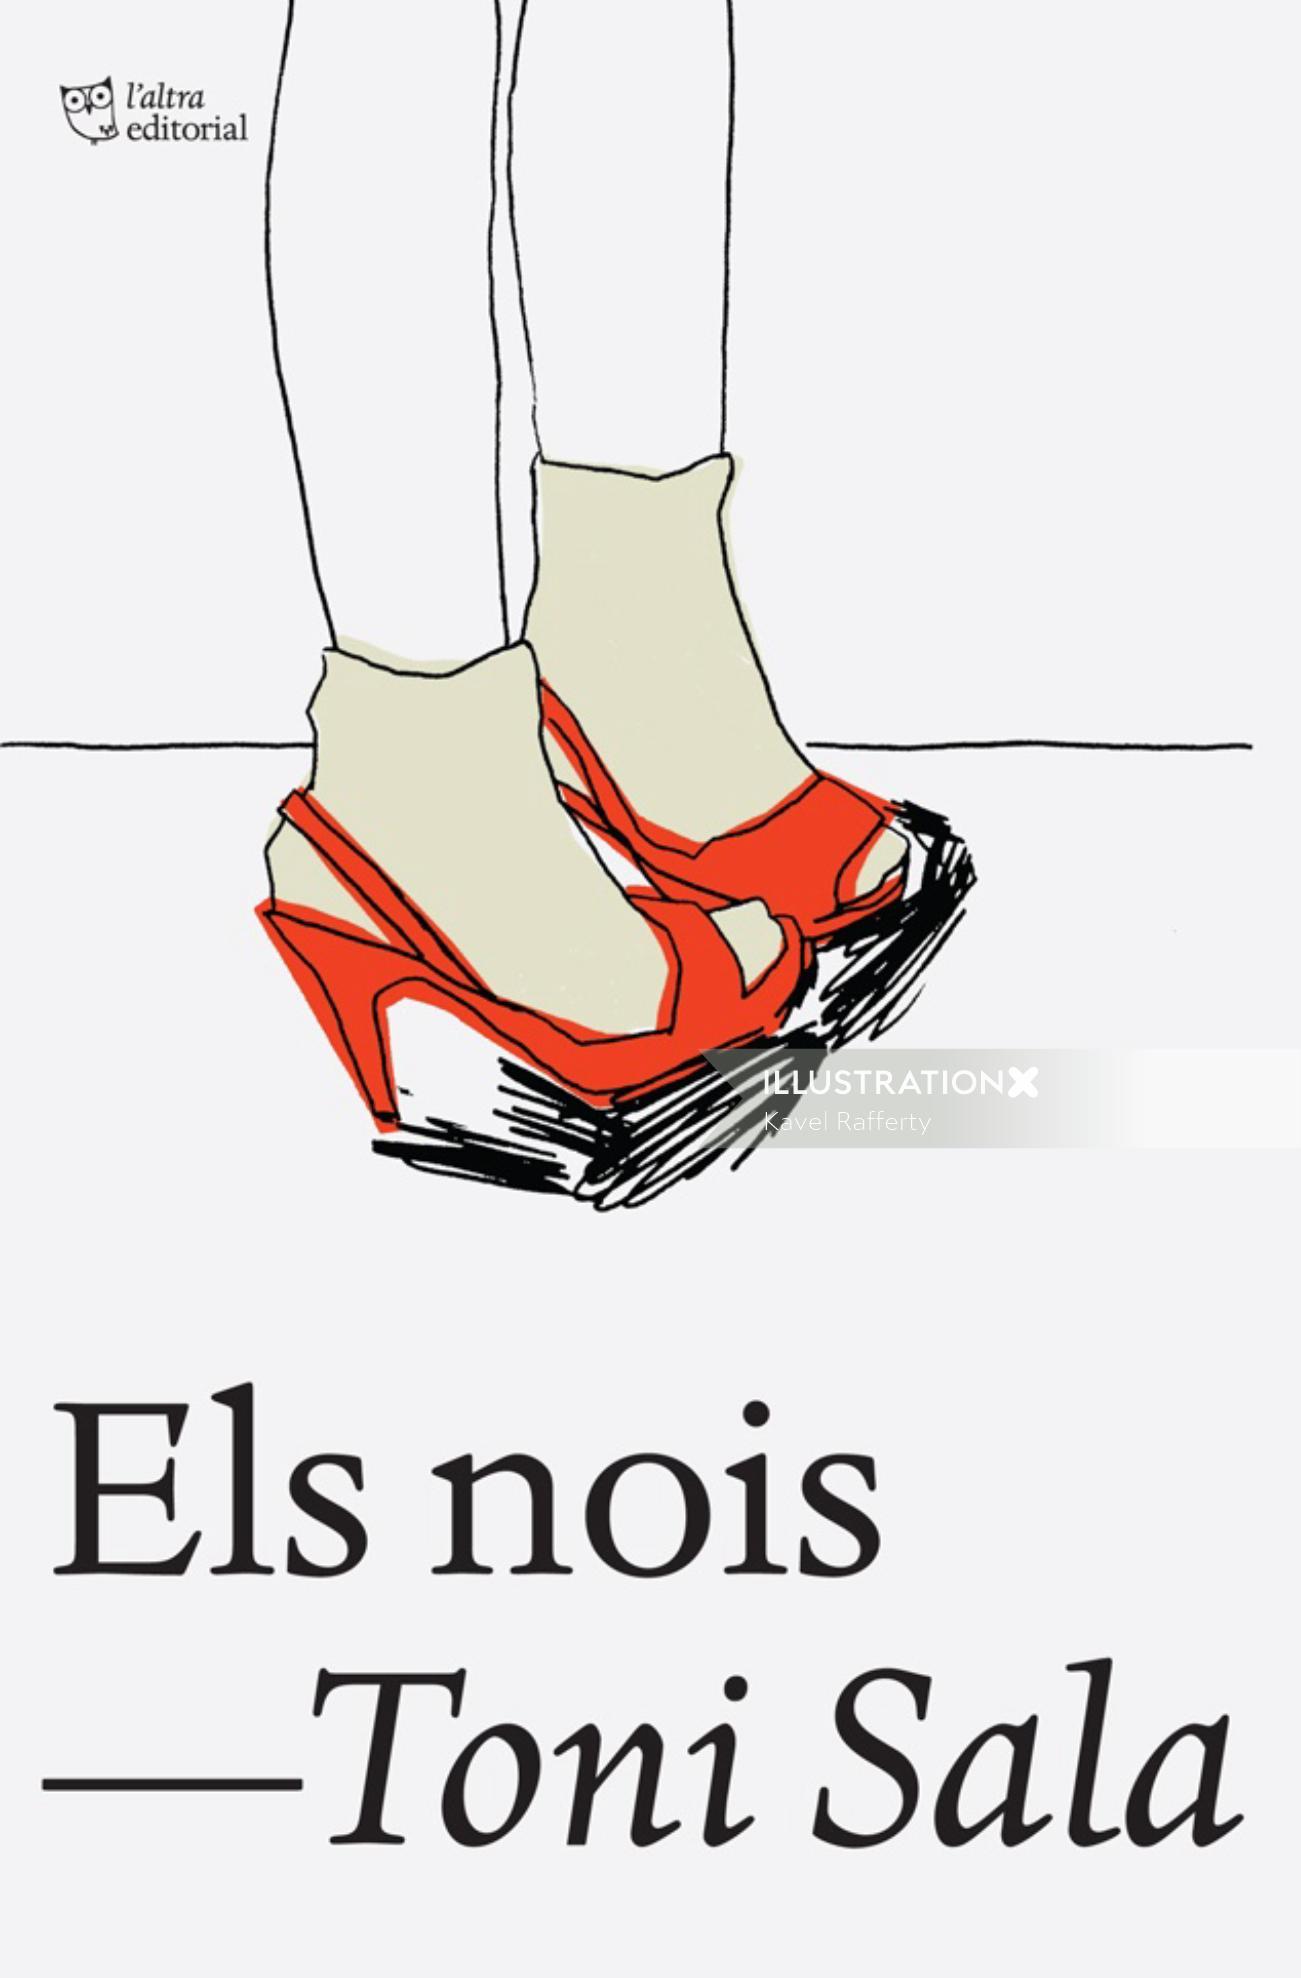 Line art of women's shoes